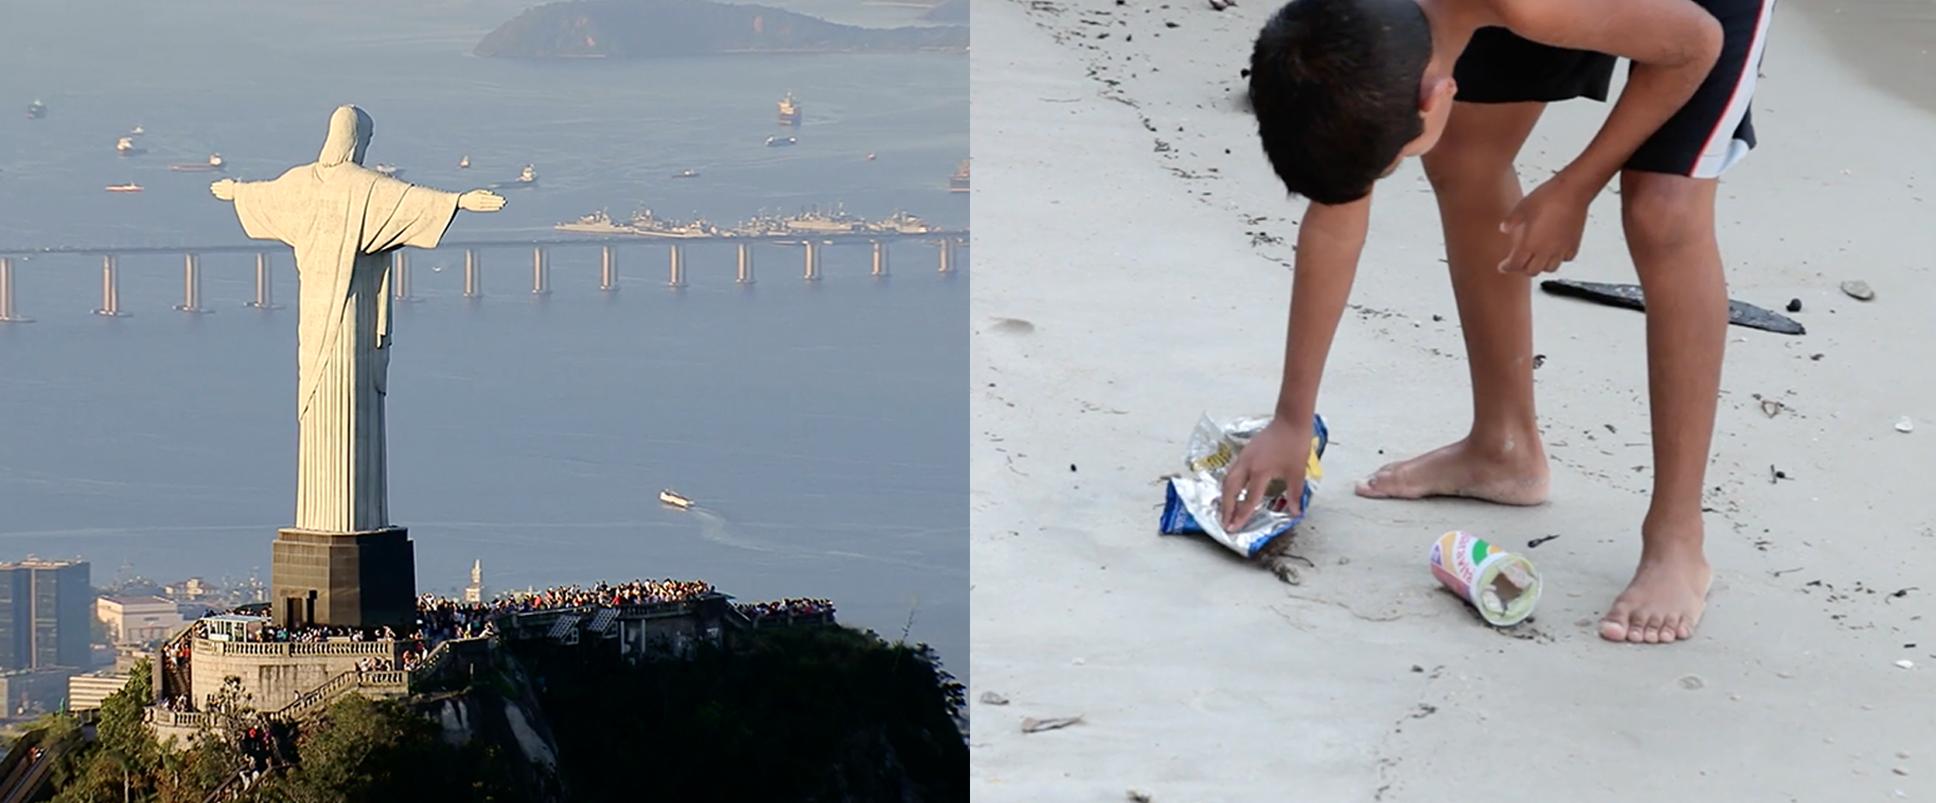 Ocean   RIO'S DISCARDED   a closer look   Read more